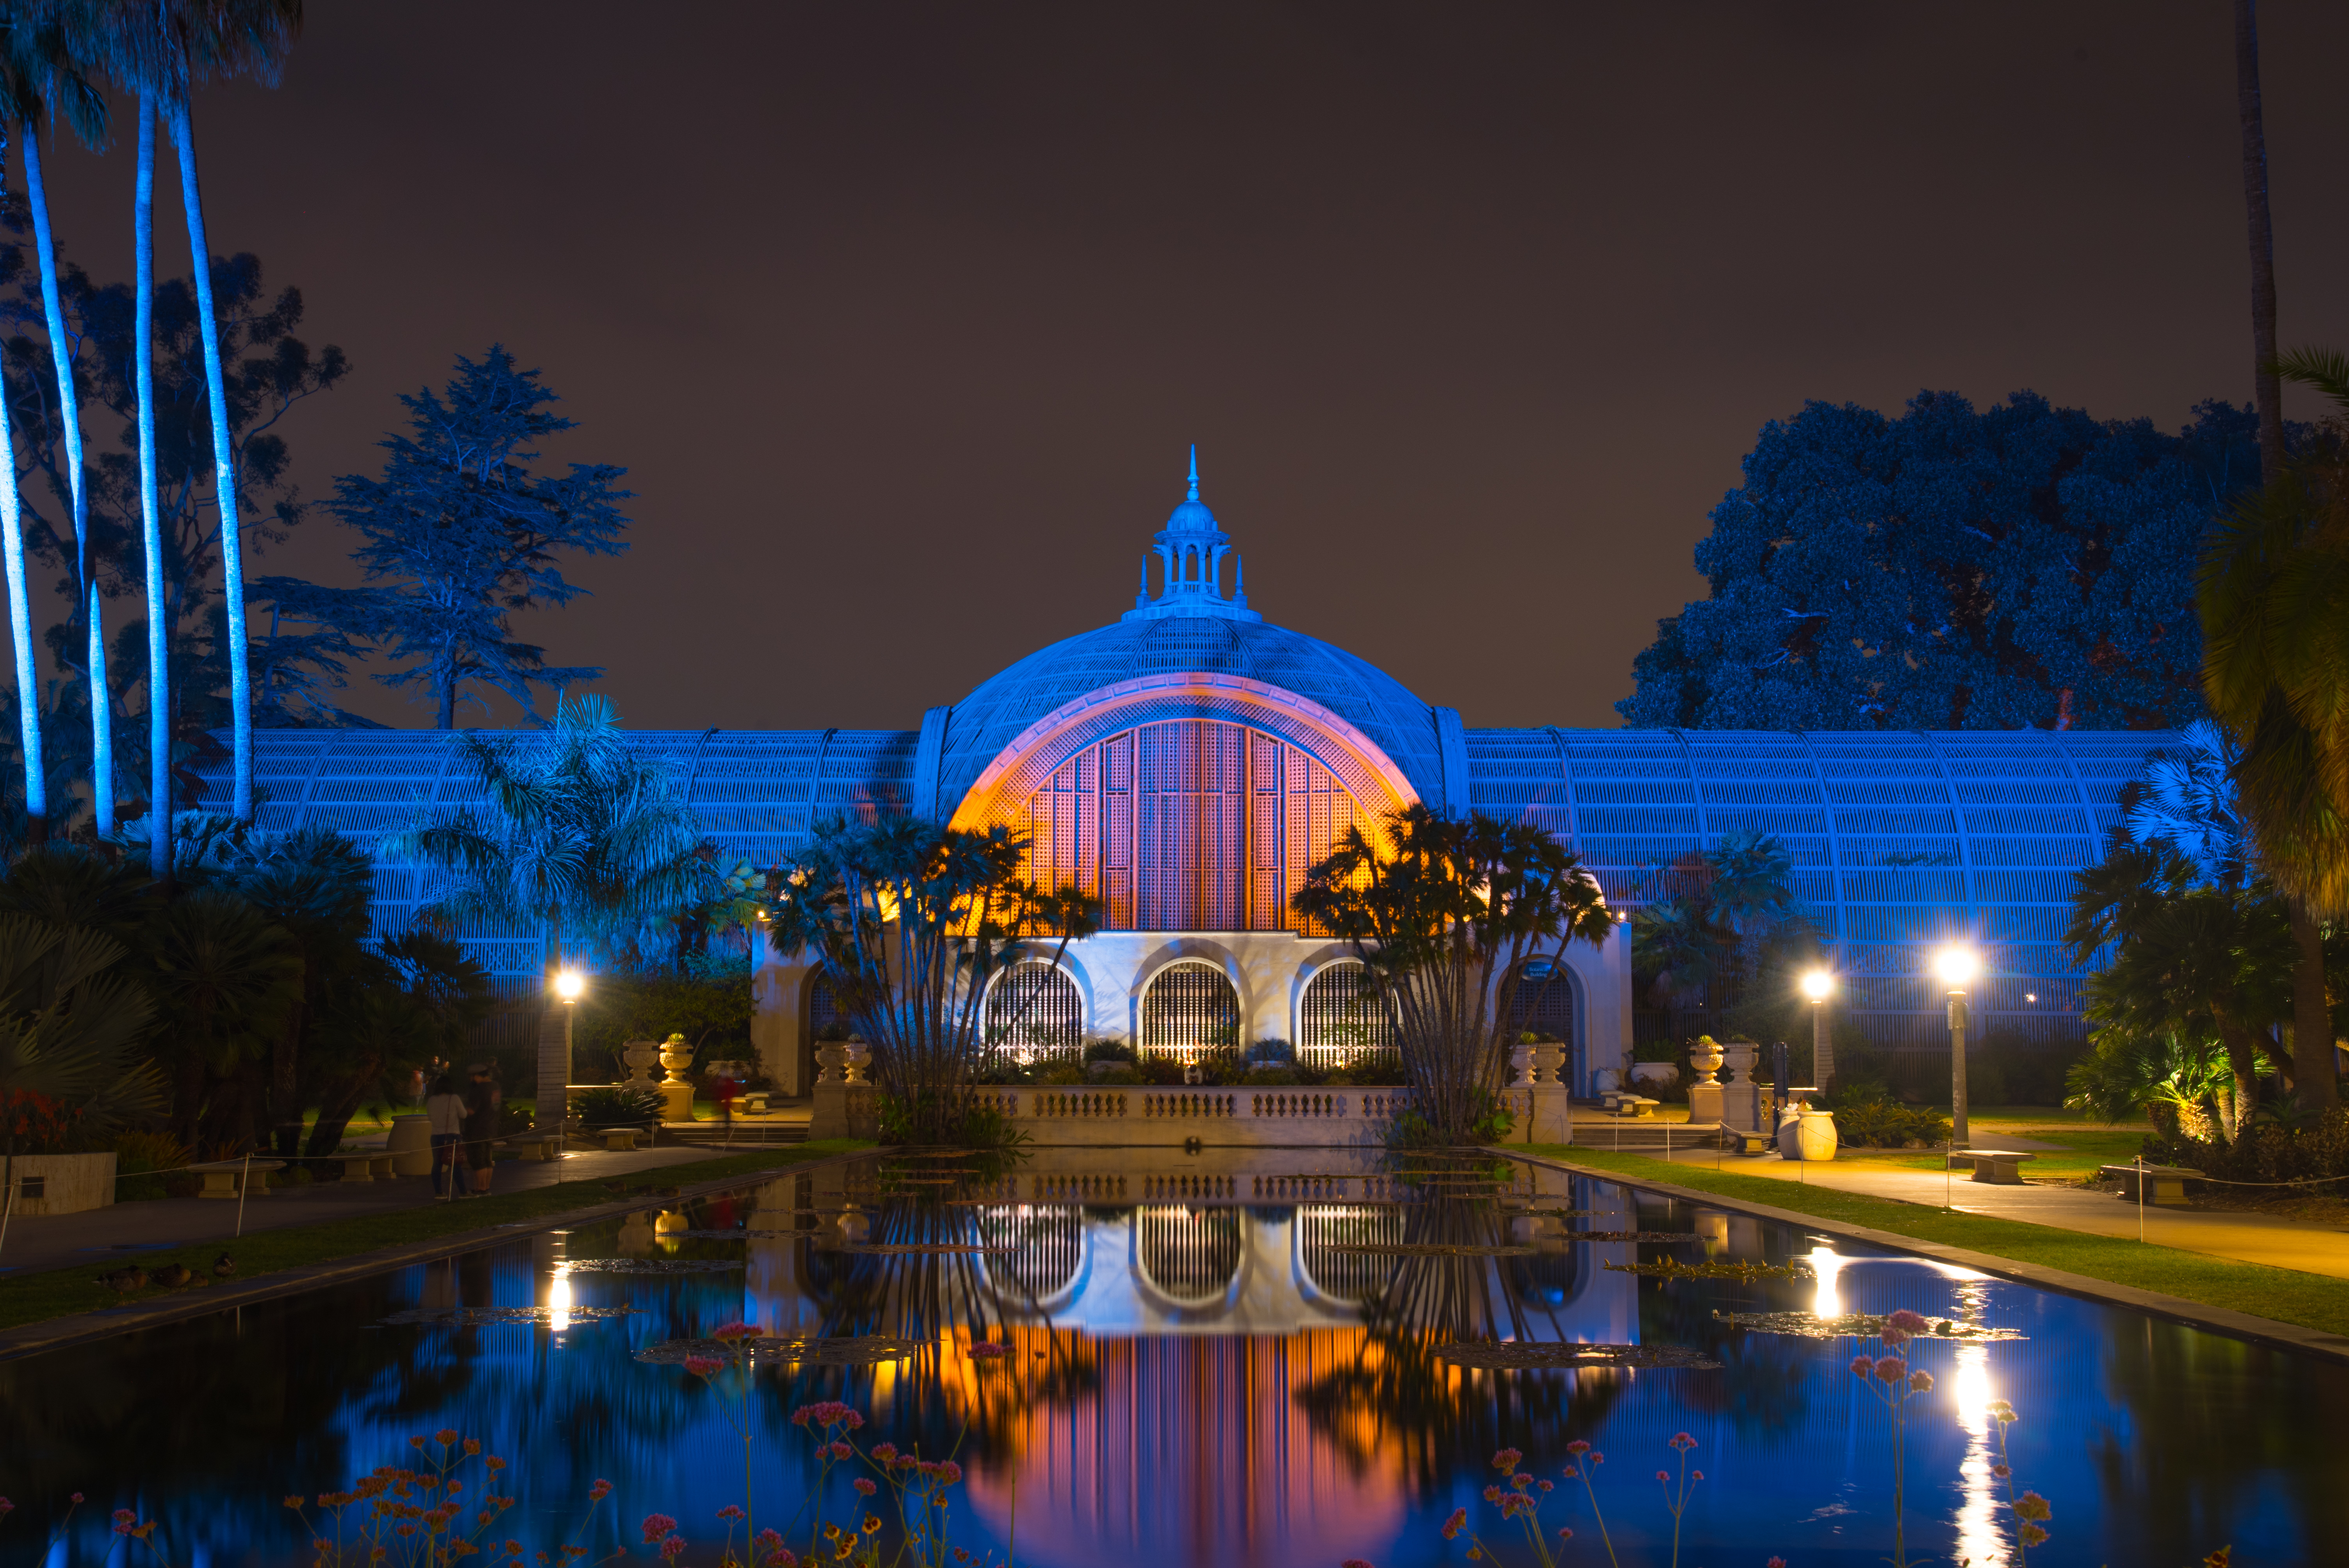 Botanical Building At Night